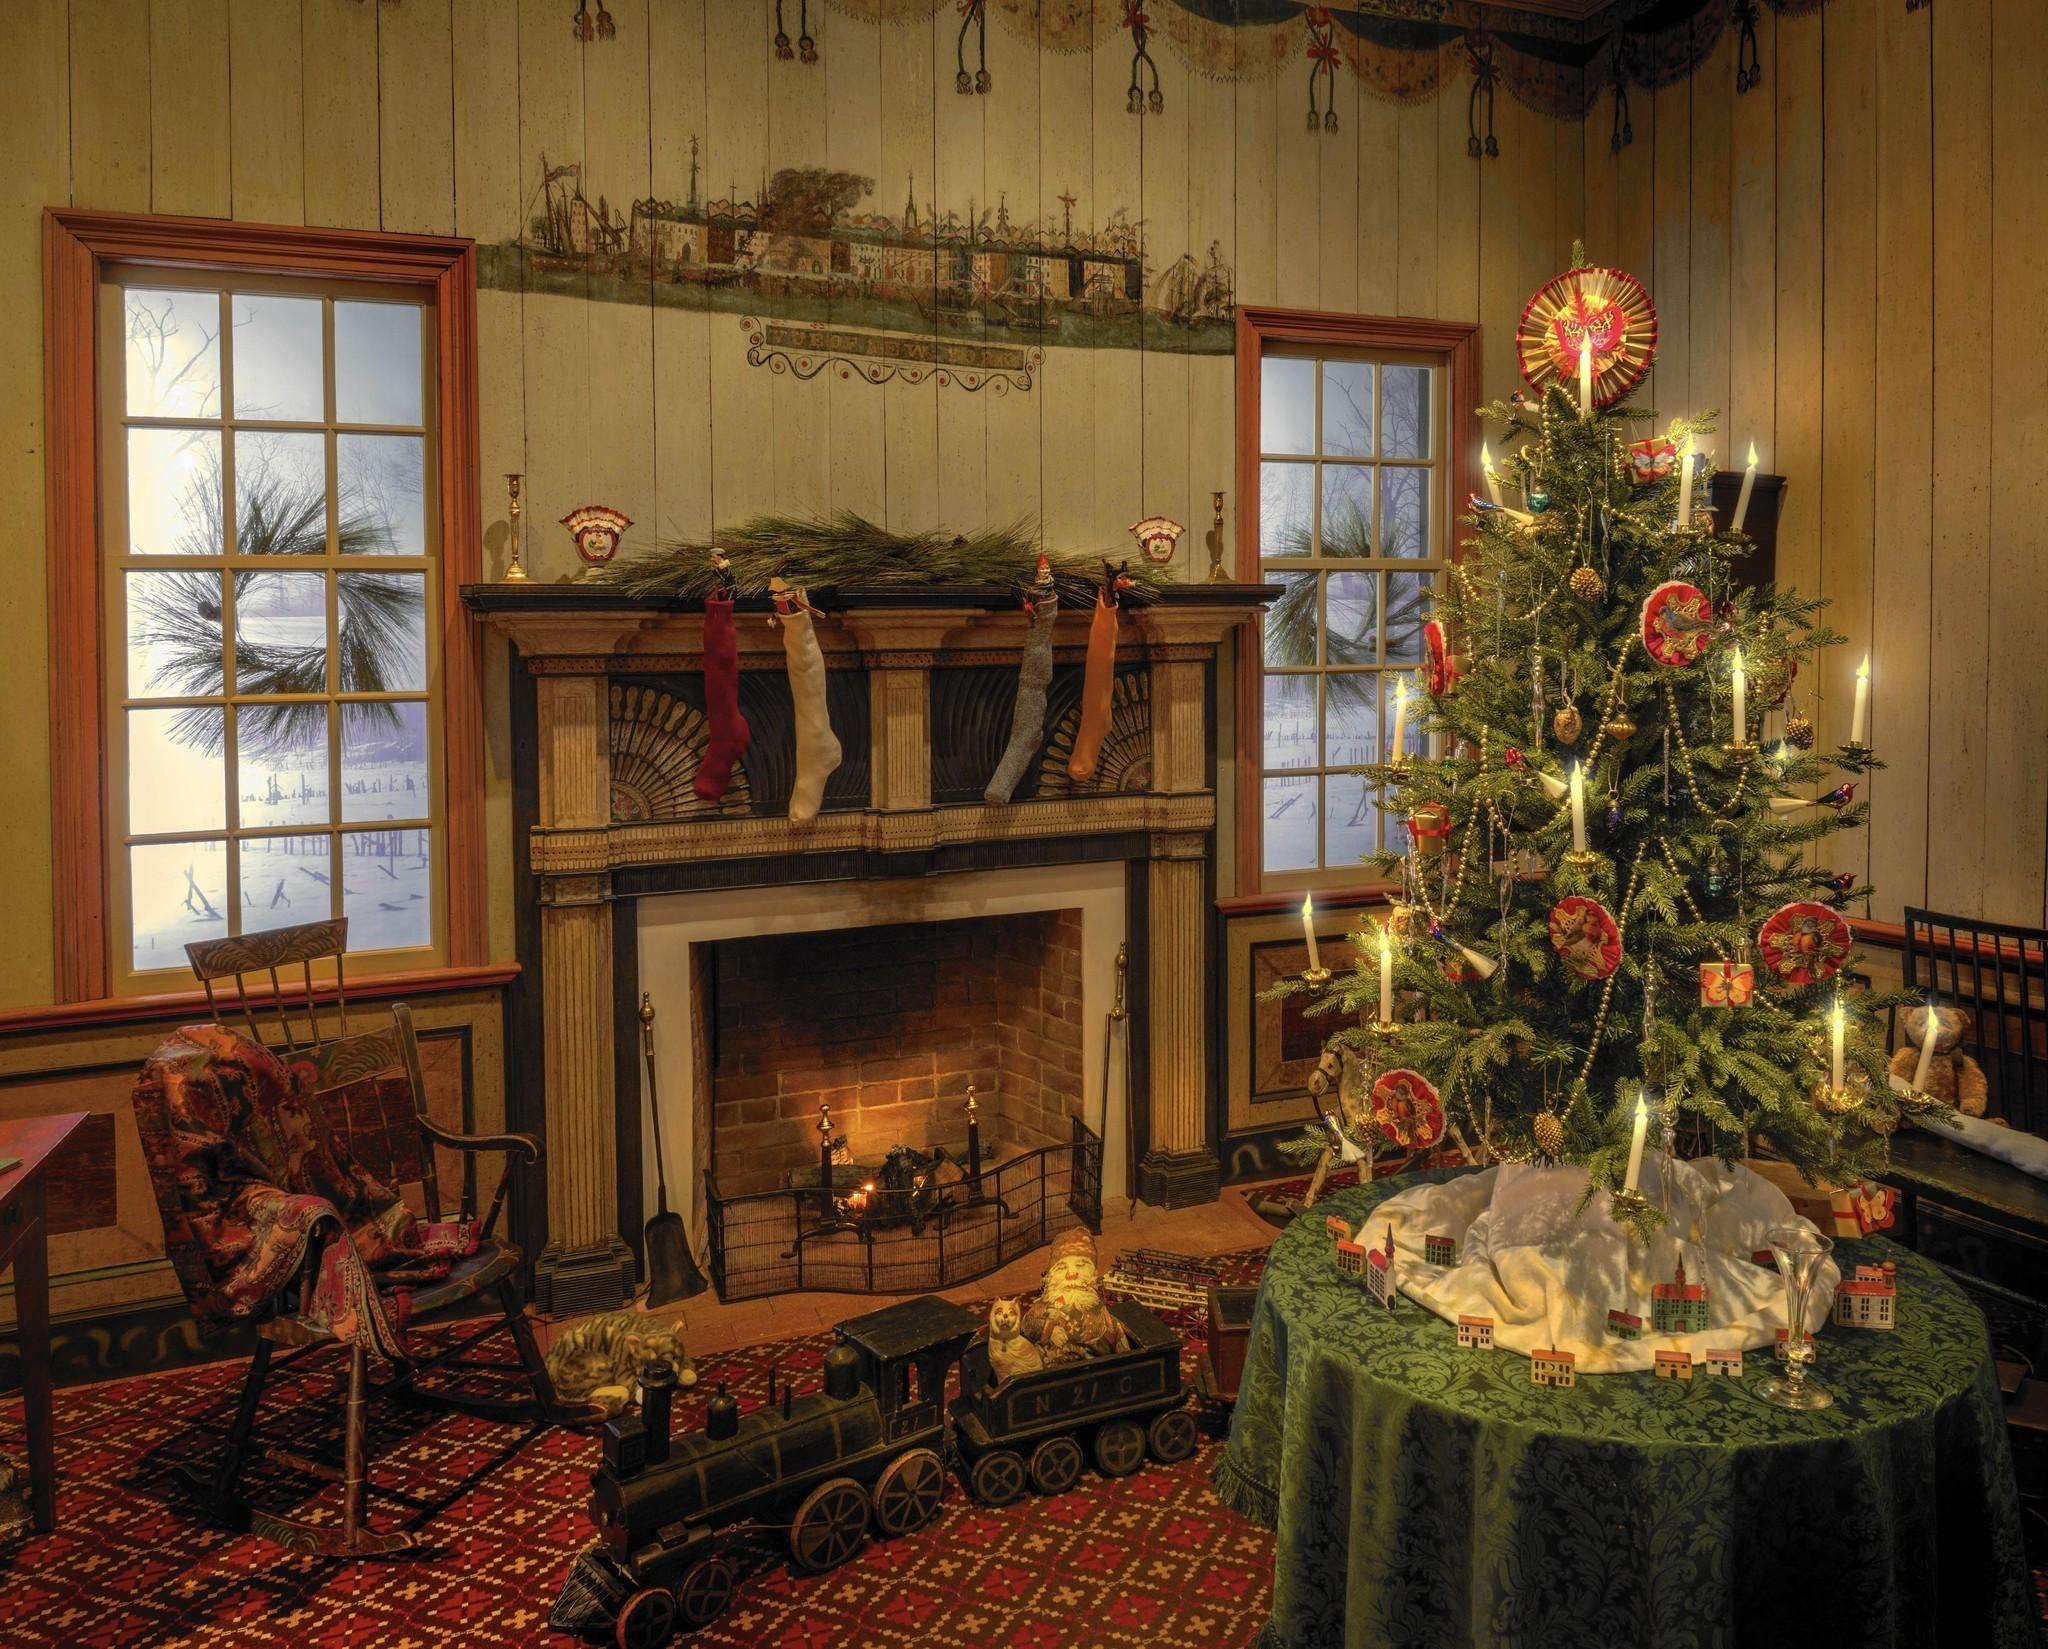 Colonial Williamsburg Christmas Exhibit Recalls The